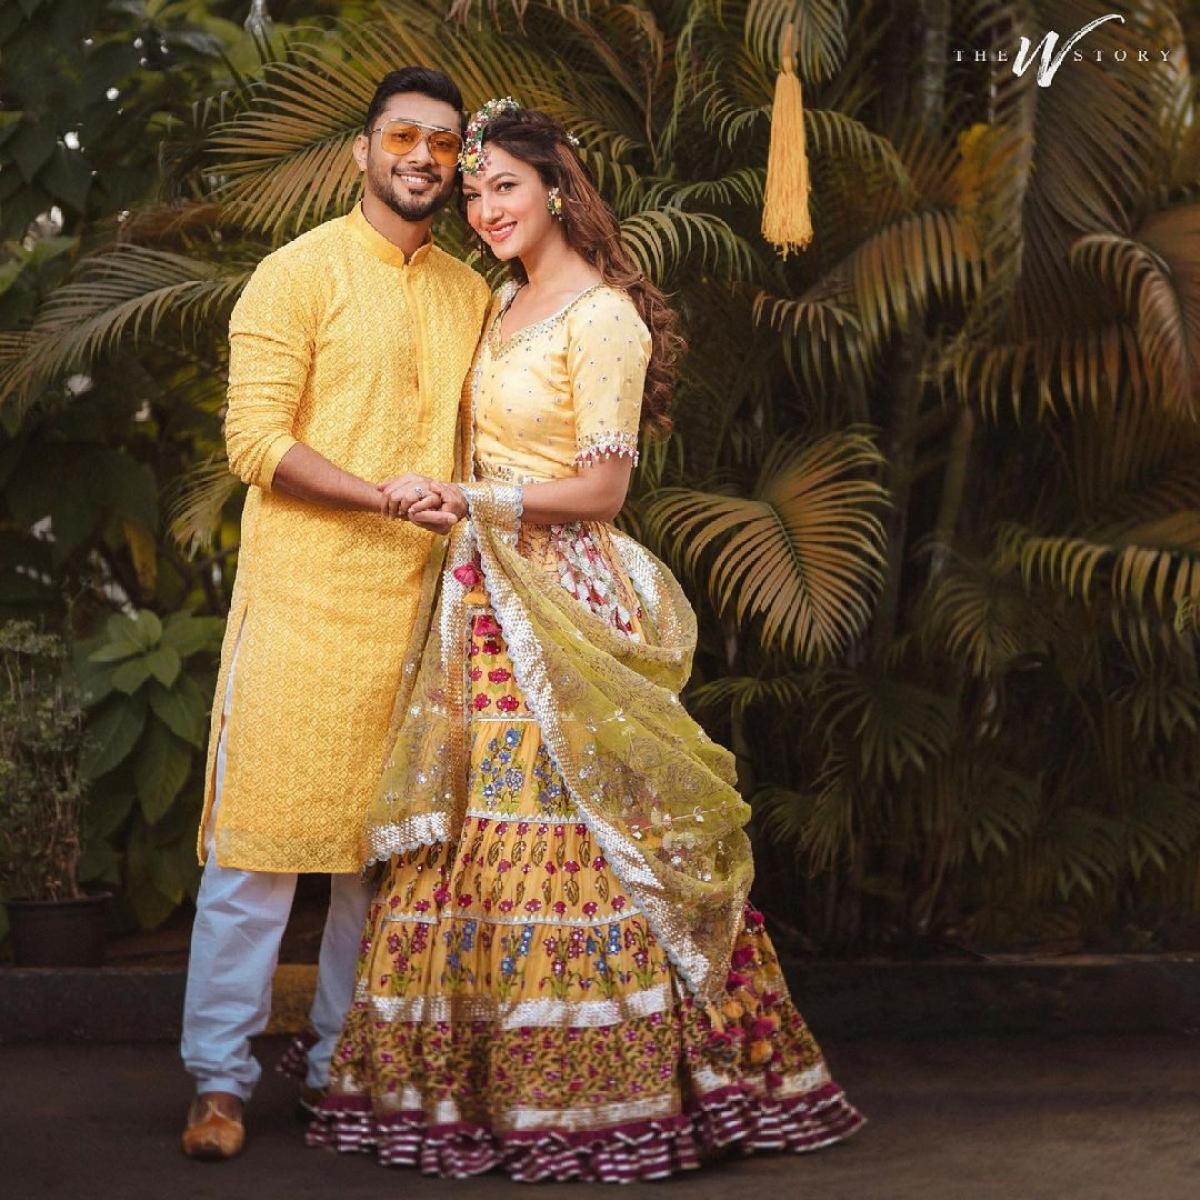 #GaZa celebrations: Gauahar Khan and Zaid Darbar share pics from pre-wedding festivities